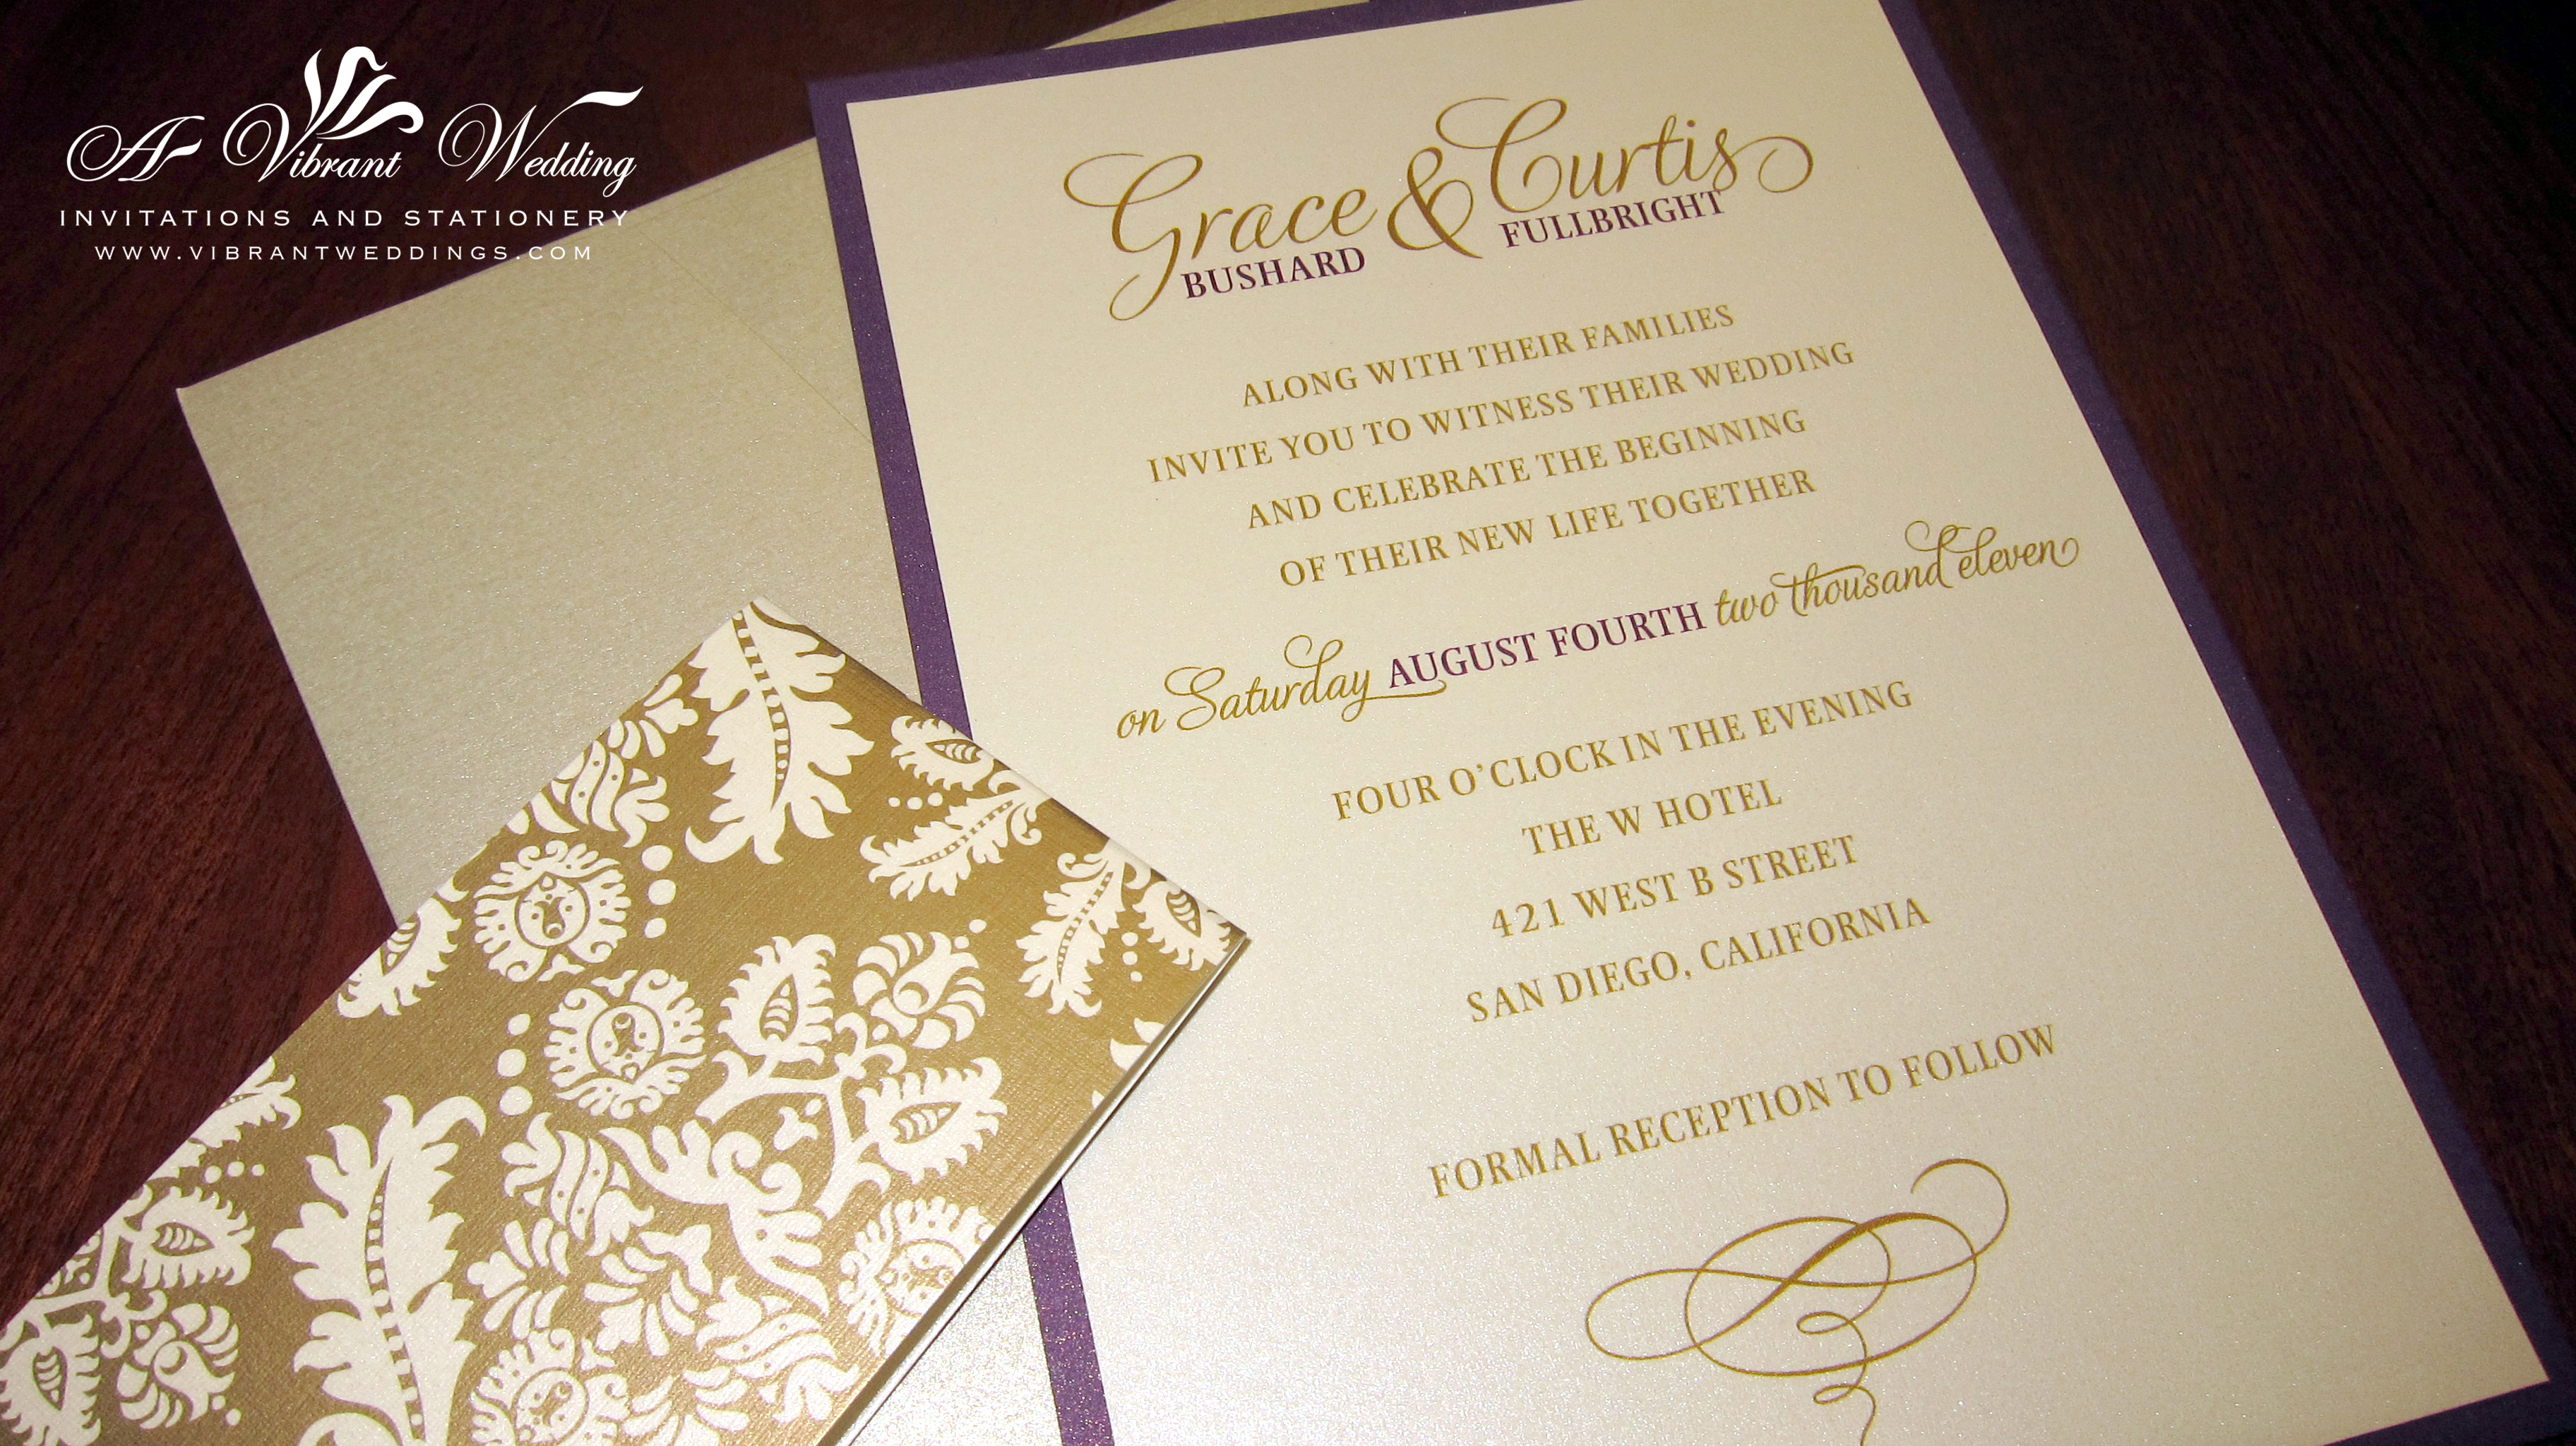 Purple Wedding Invitation A Vibrant Wedding Web Blog v6hv9XyL